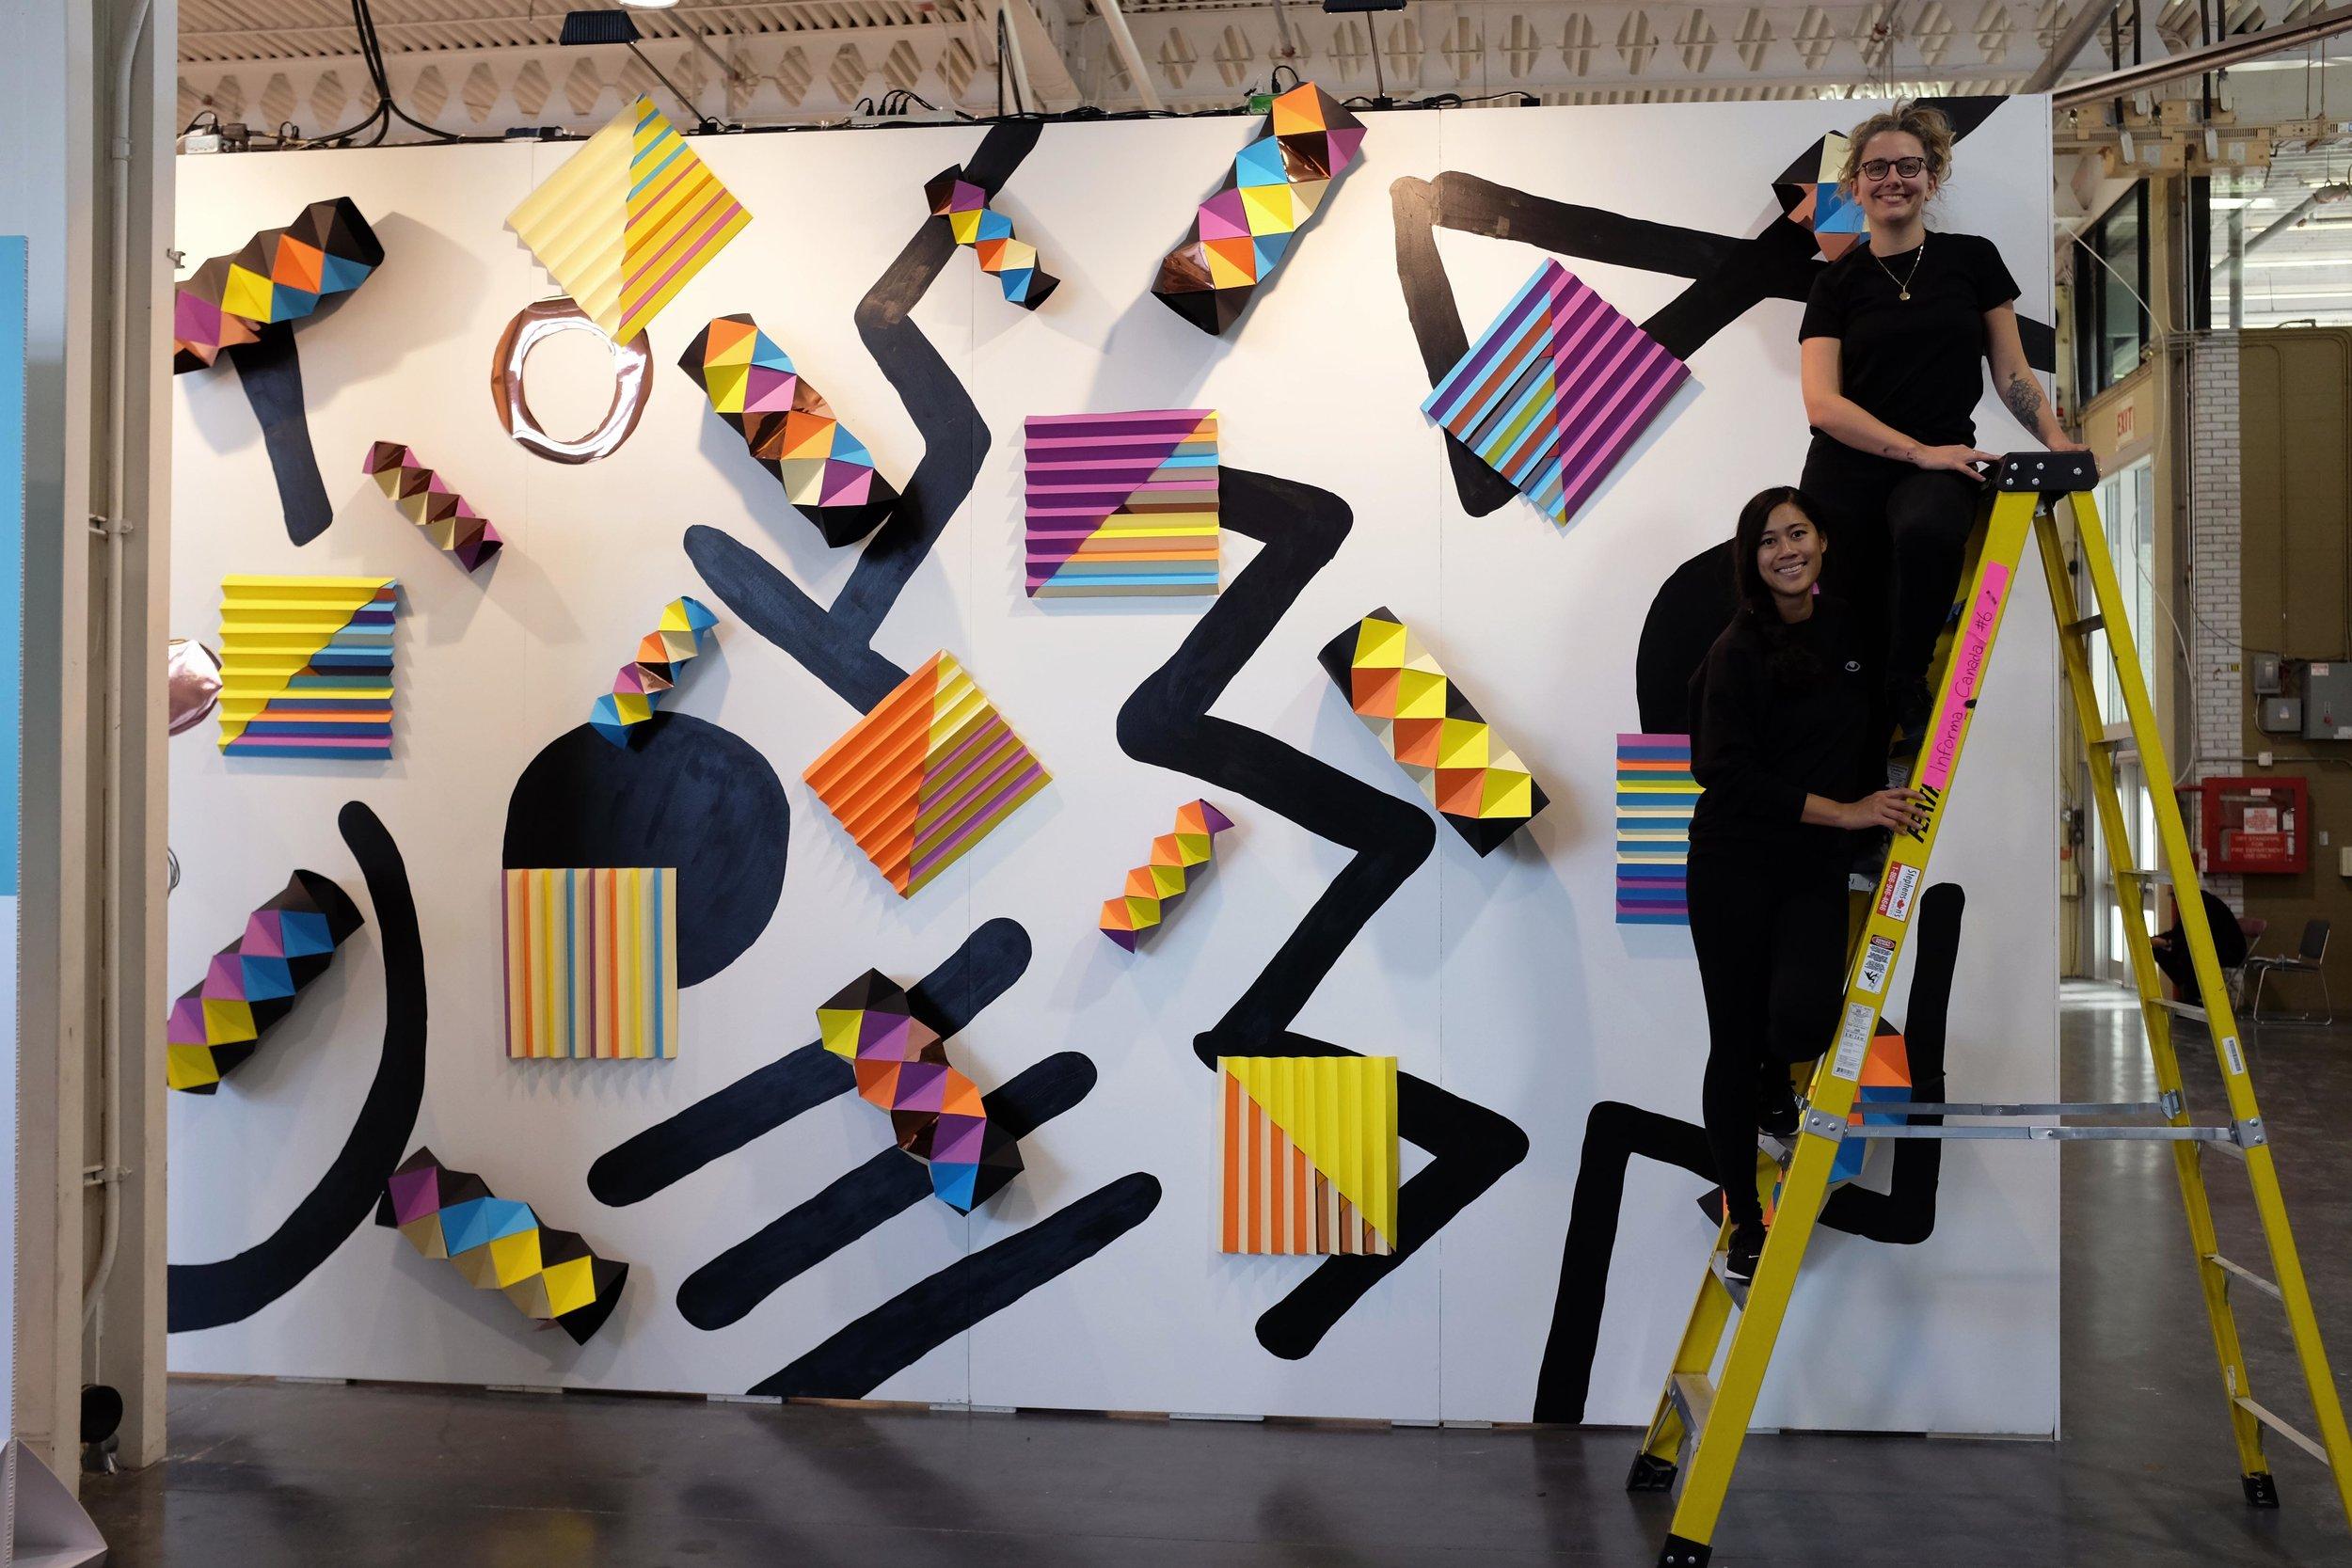 miss-cloudy-pauline-loctin-artist-project-2019-paper-art-origami-entrance-toronto-14.jpg